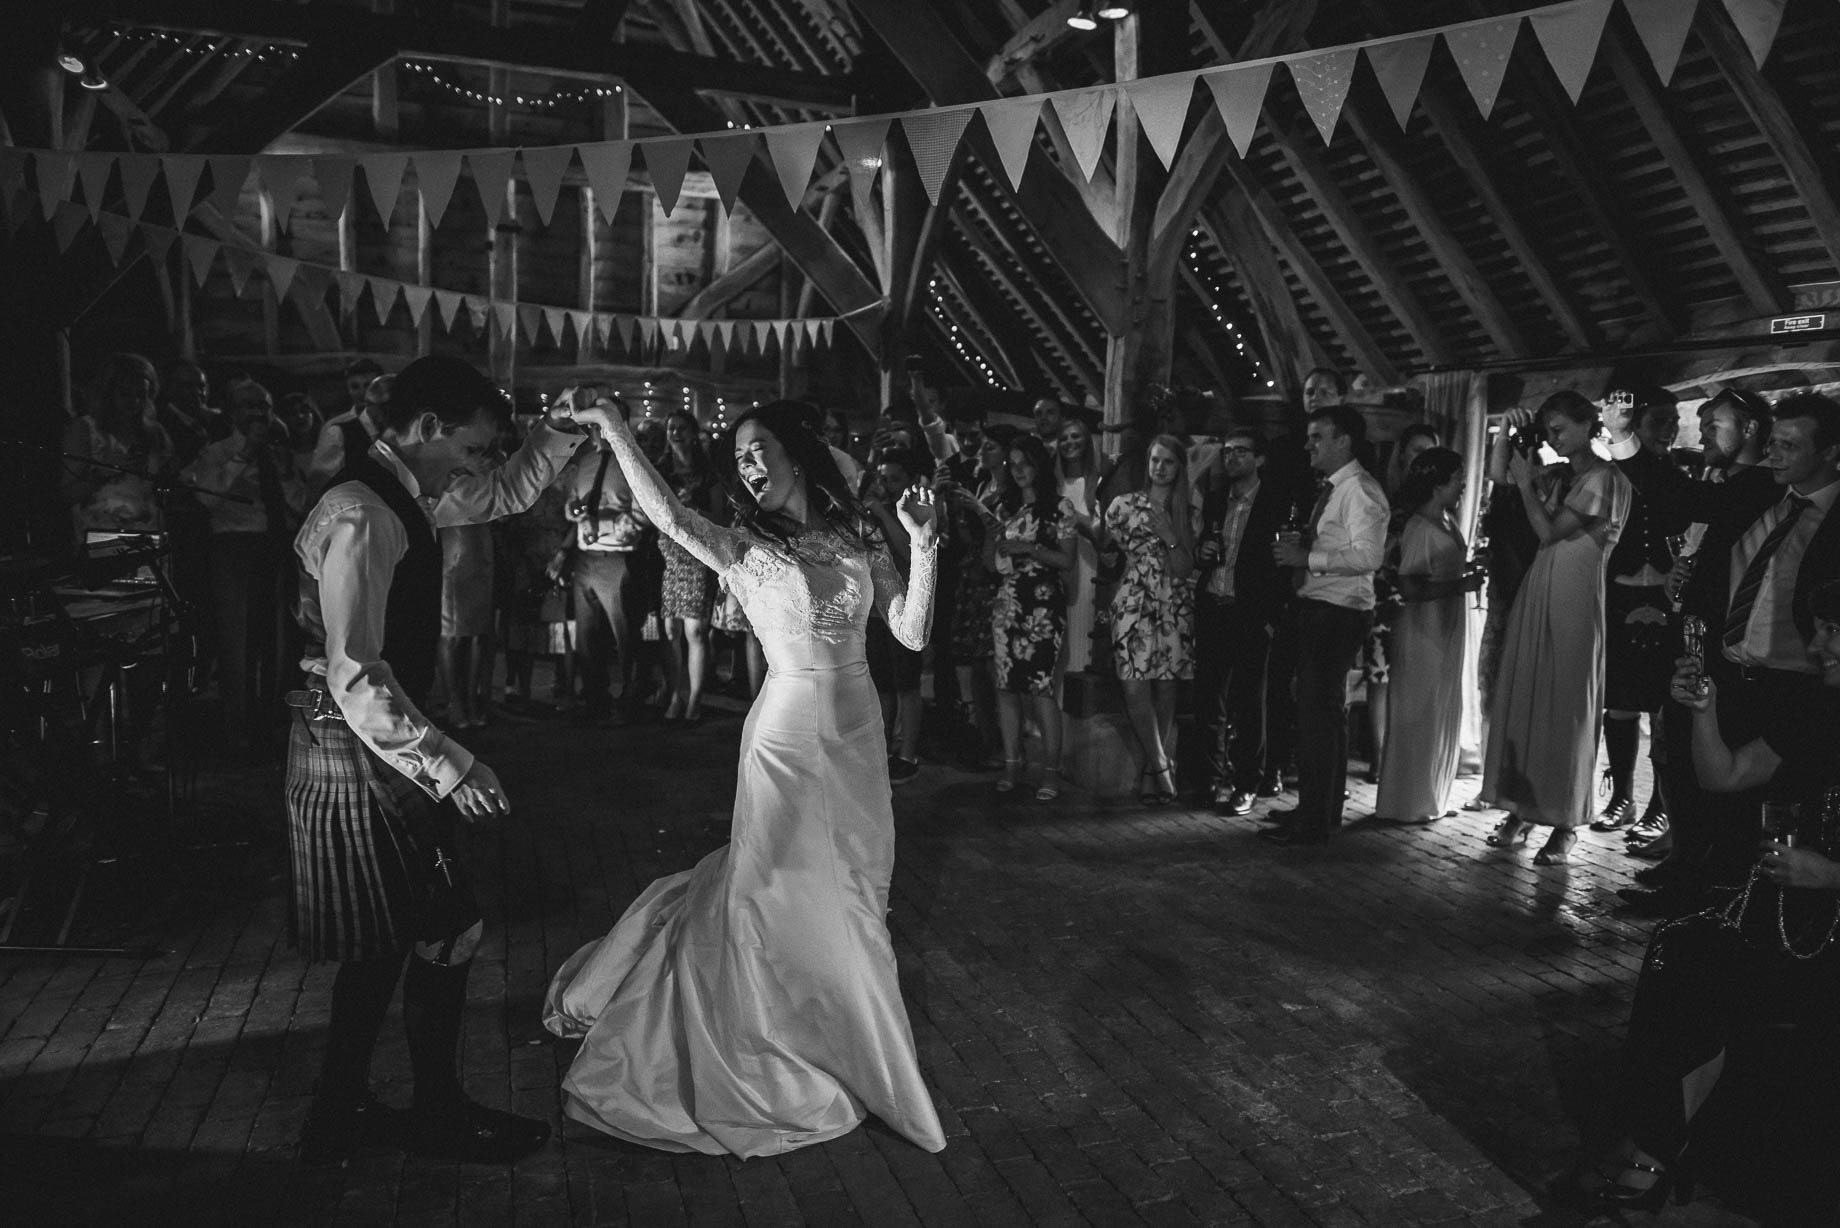 Gildings Barn wedding photography - Sarah and Steve (179 of 190)